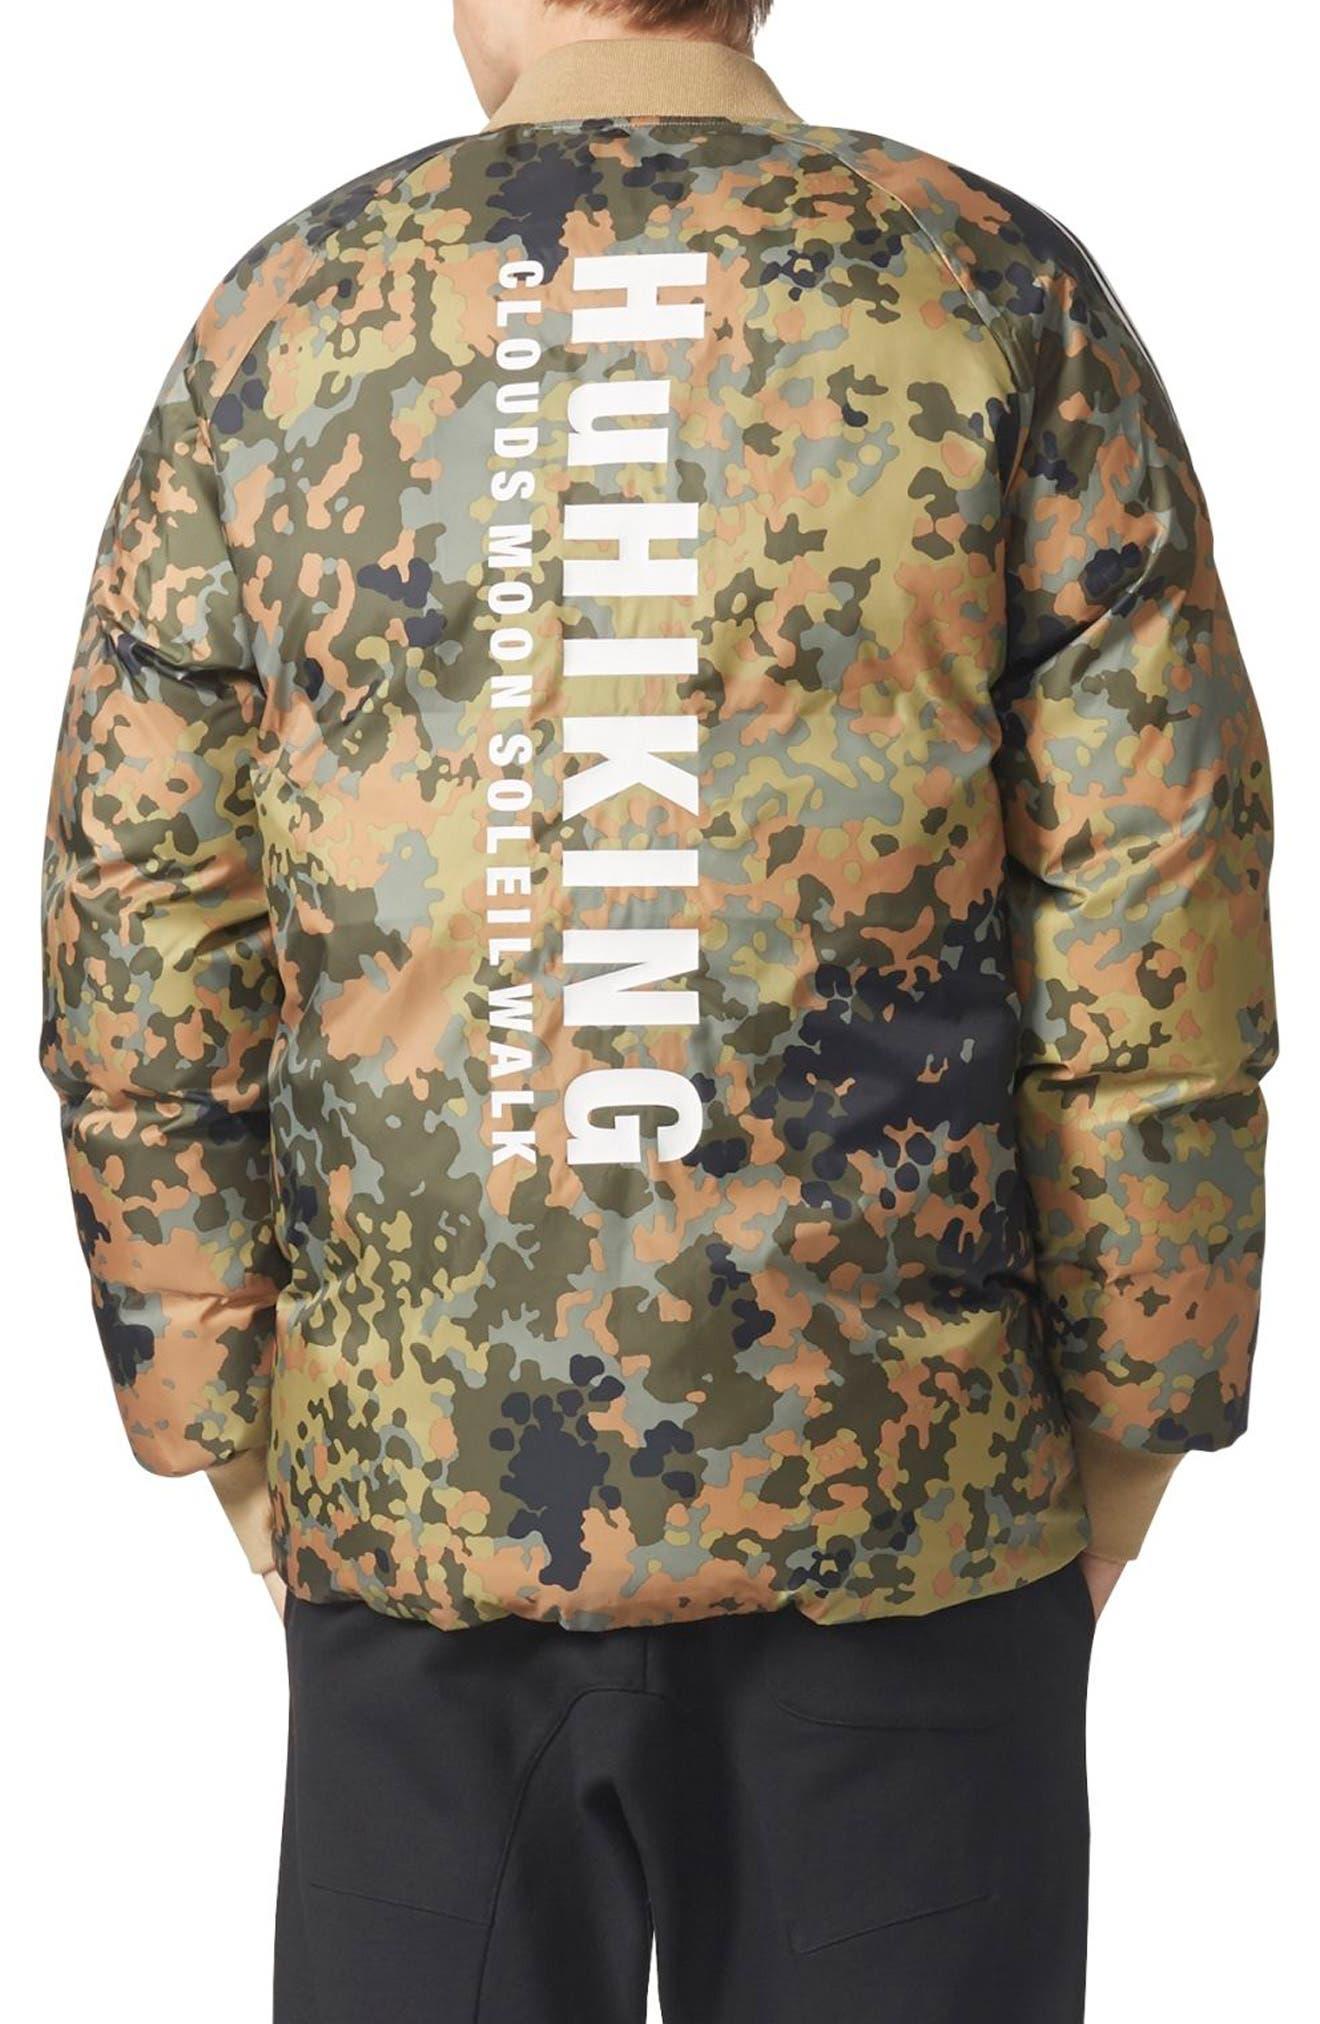 Originals SST Reversible Winter Jacket,                             Alternate thumbnail 2, color,                             Camo/ Hemp